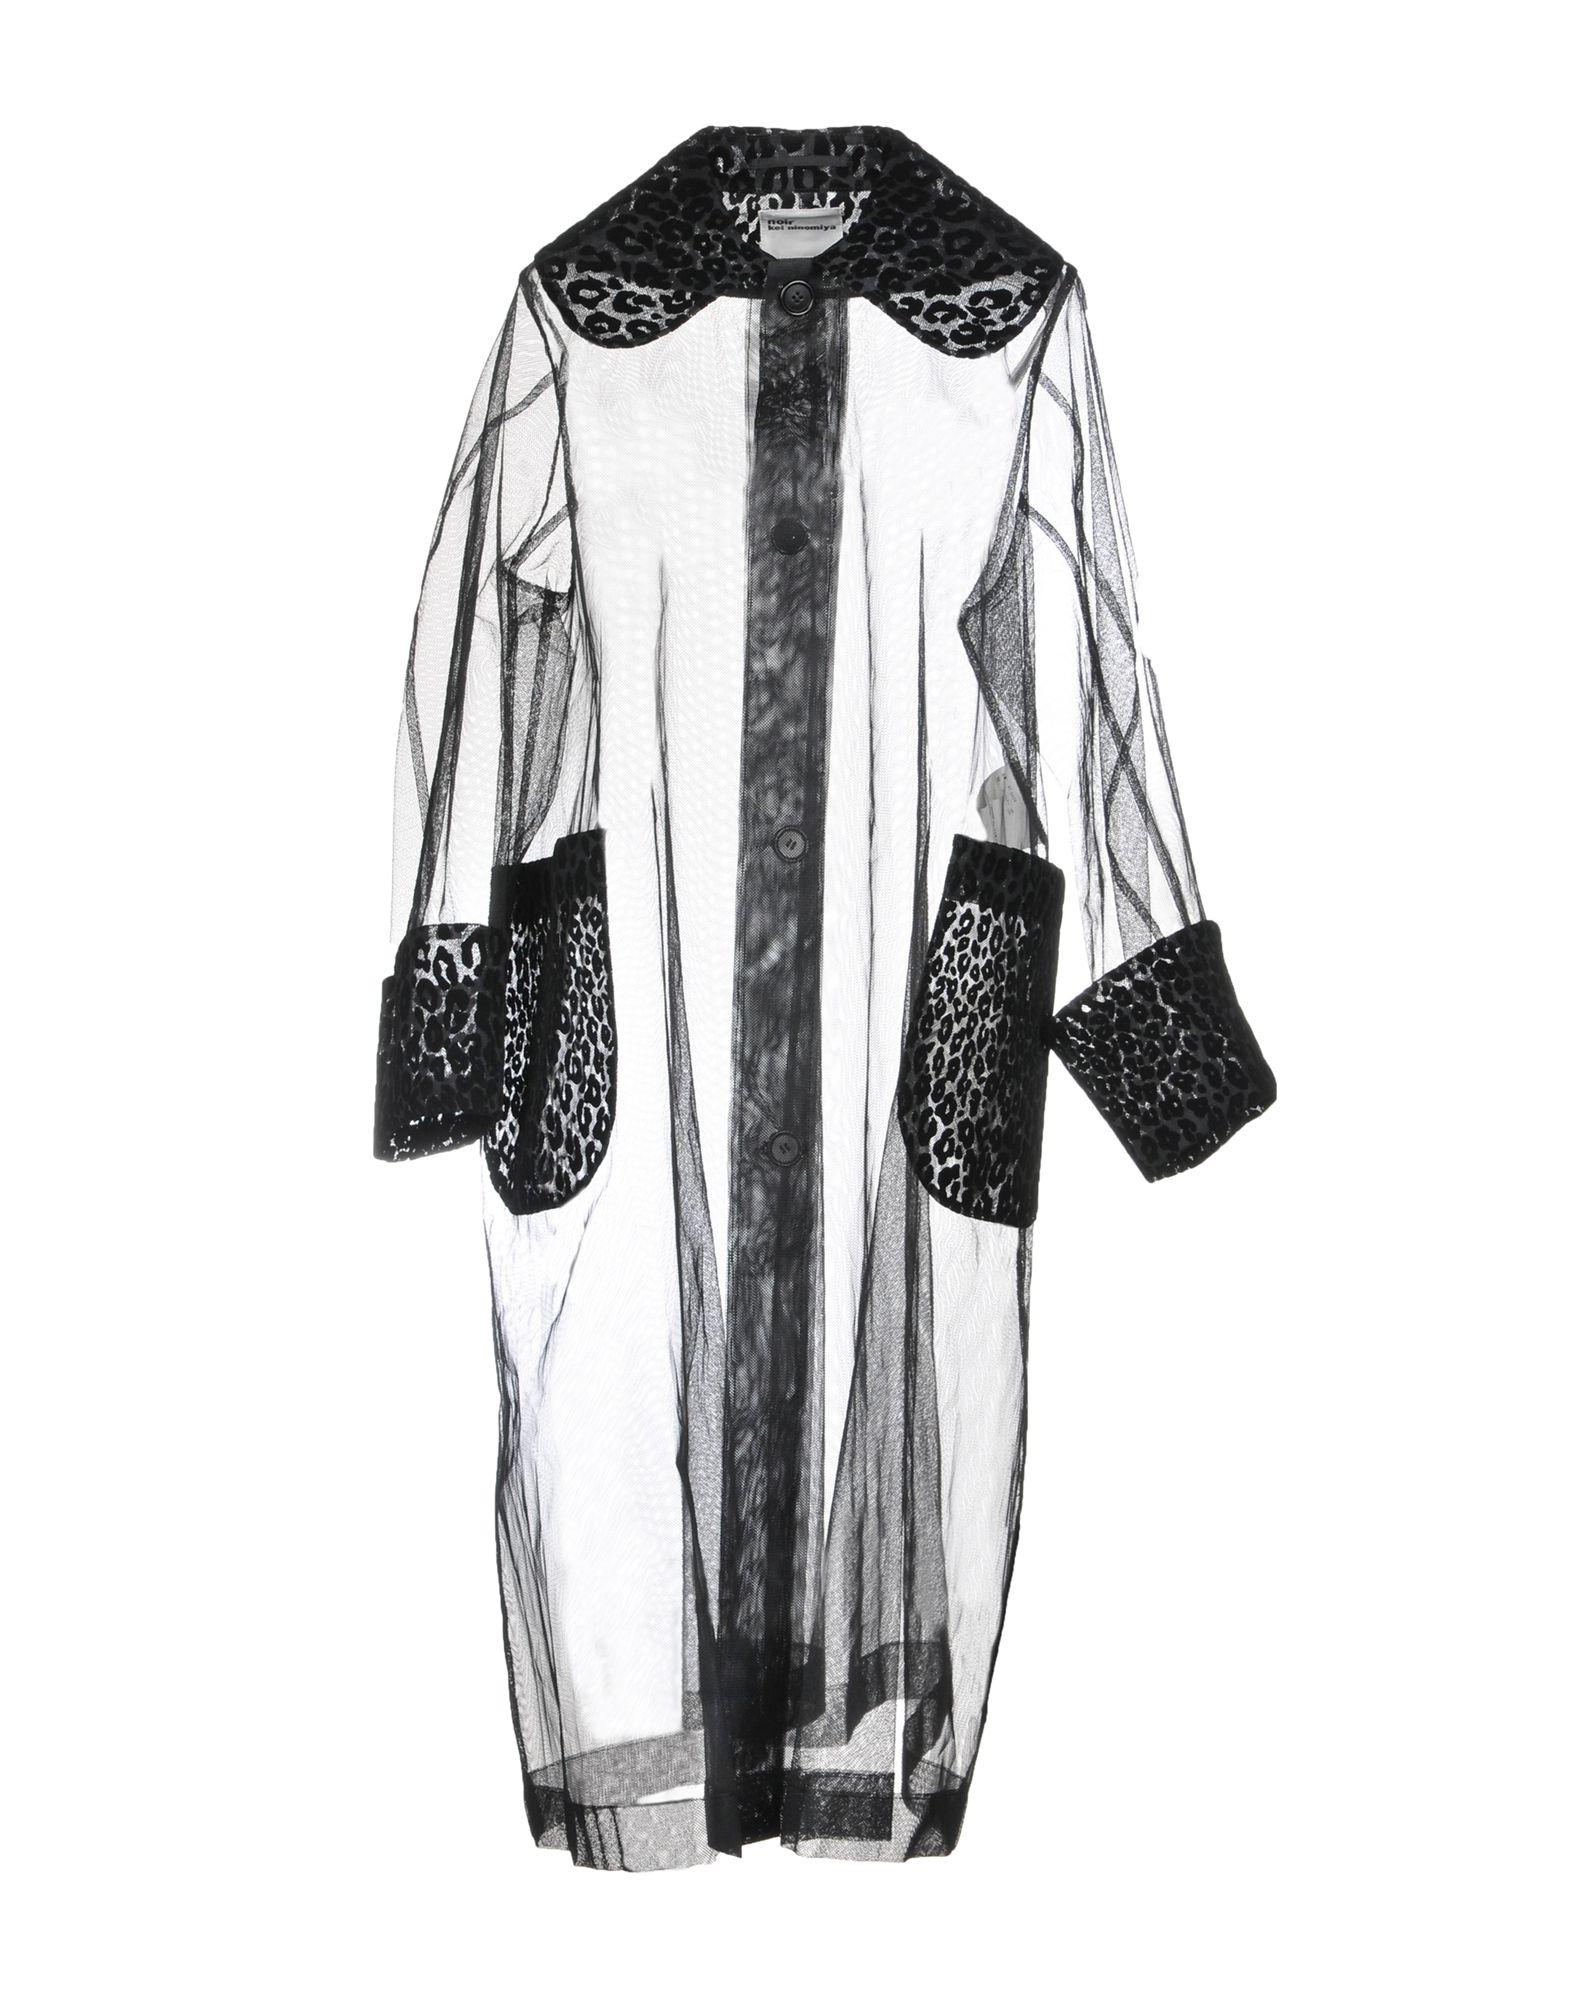 NOIR KEI NINOMIYA Overcoats in Black